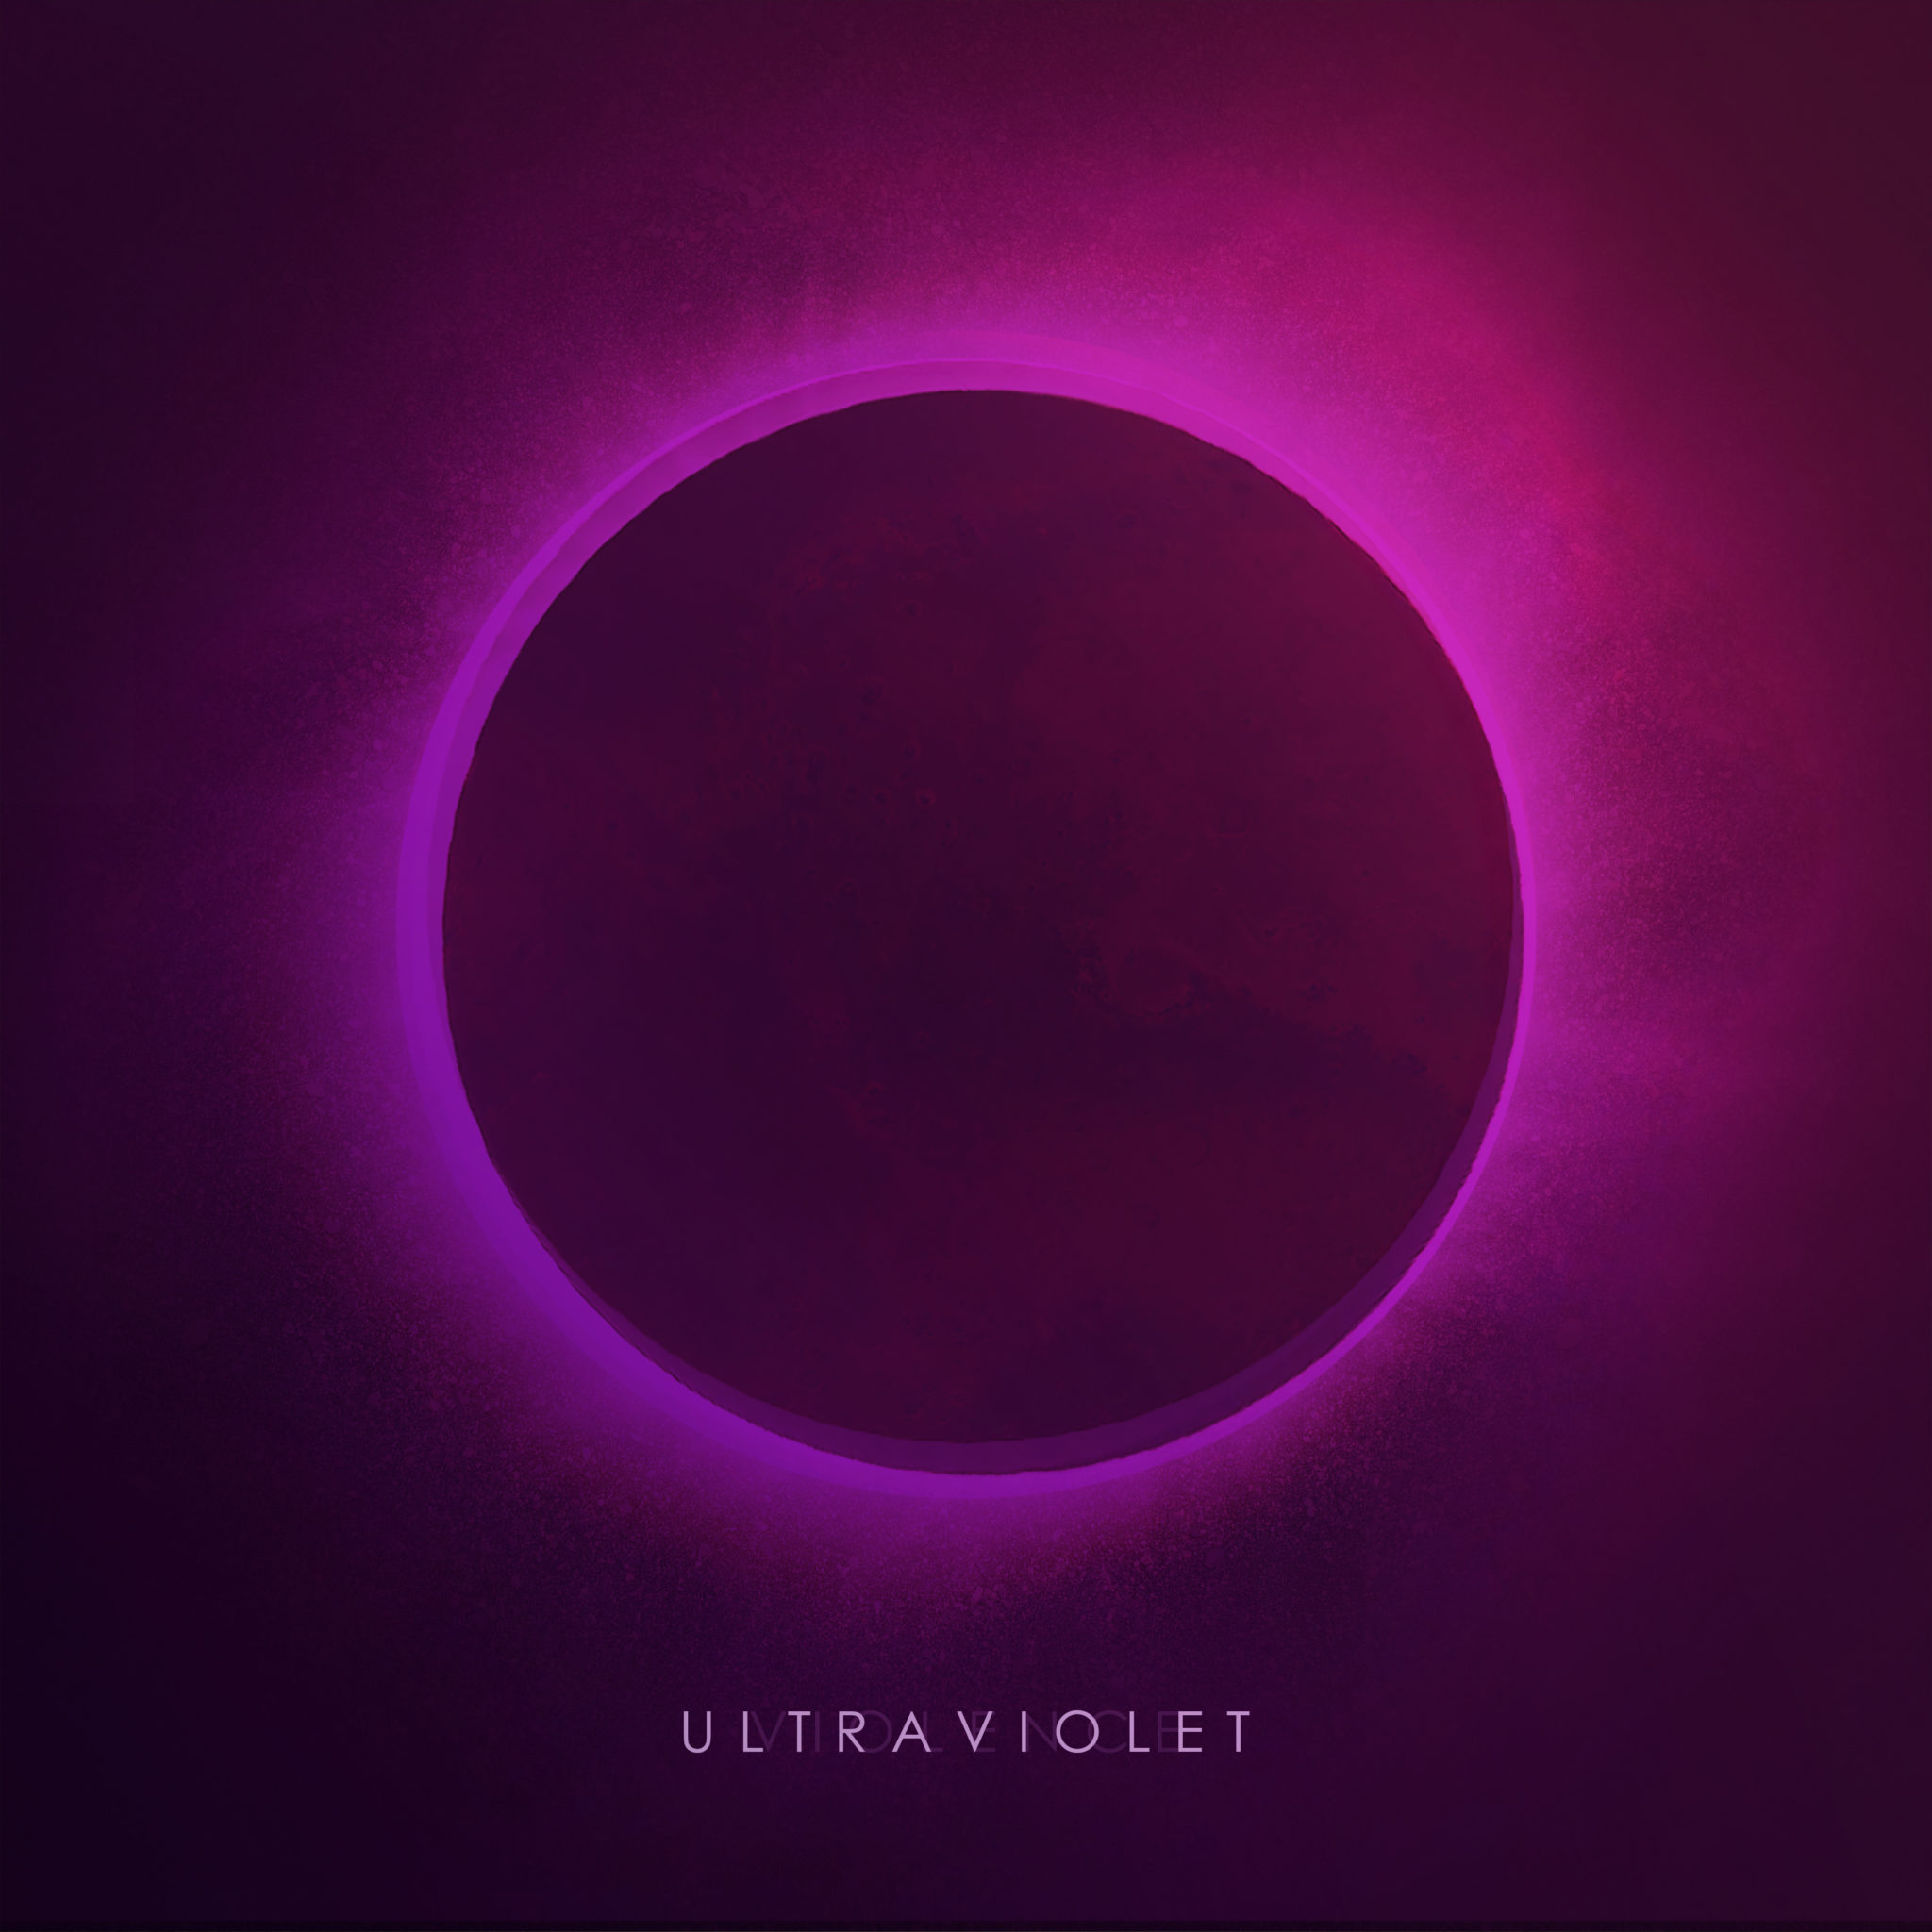 my_epic-solar-ultraviolet-3600x3600.jpg